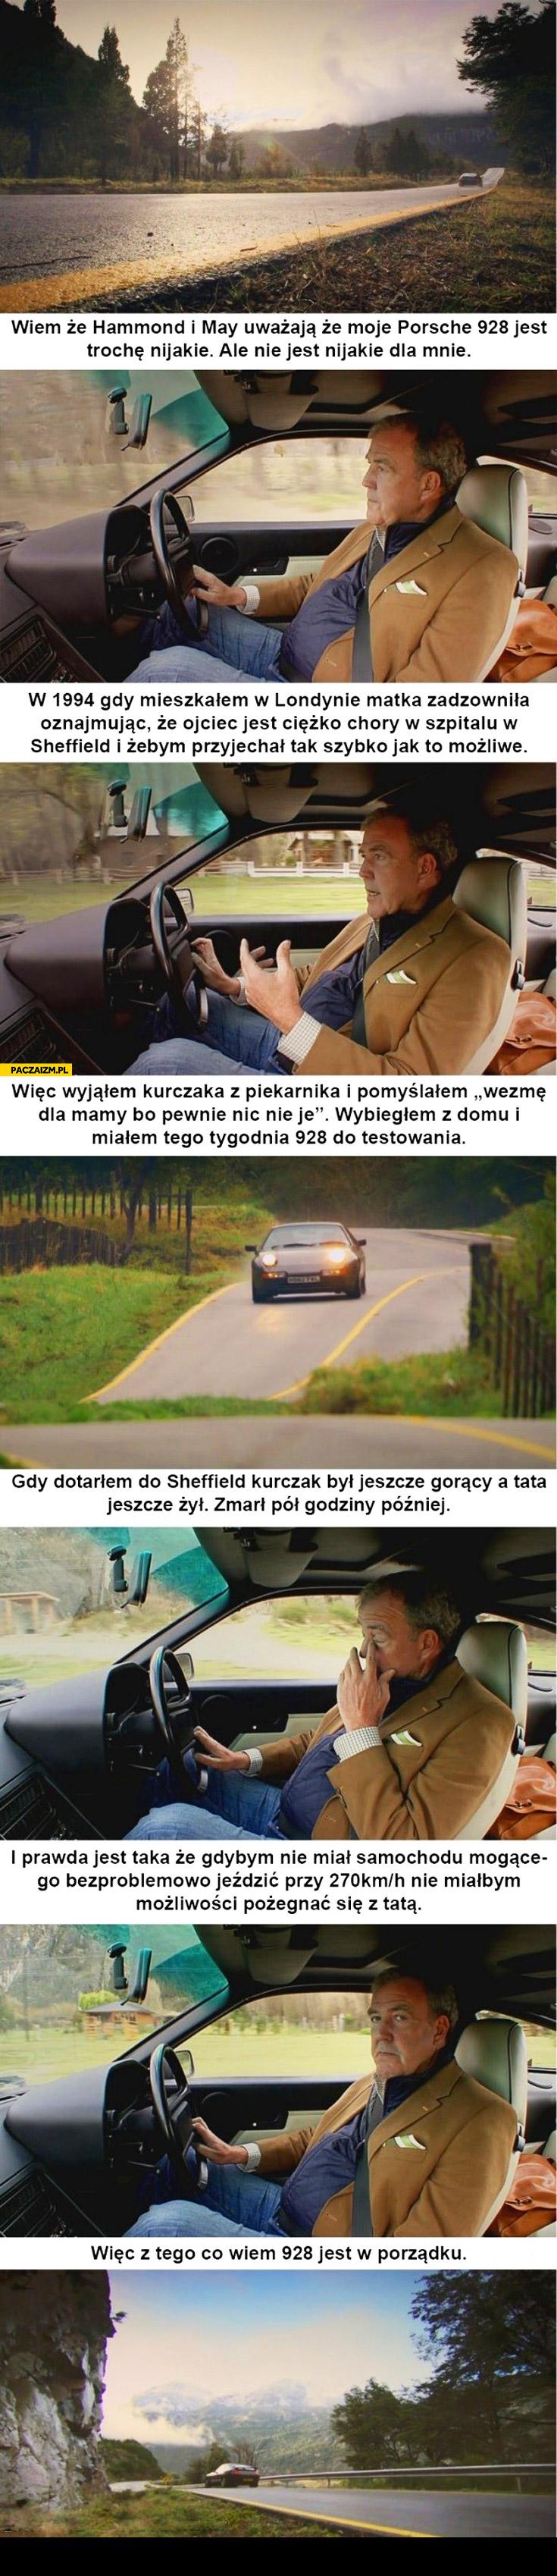 Clarkson o Porsche 928 historia kurczak ojciec